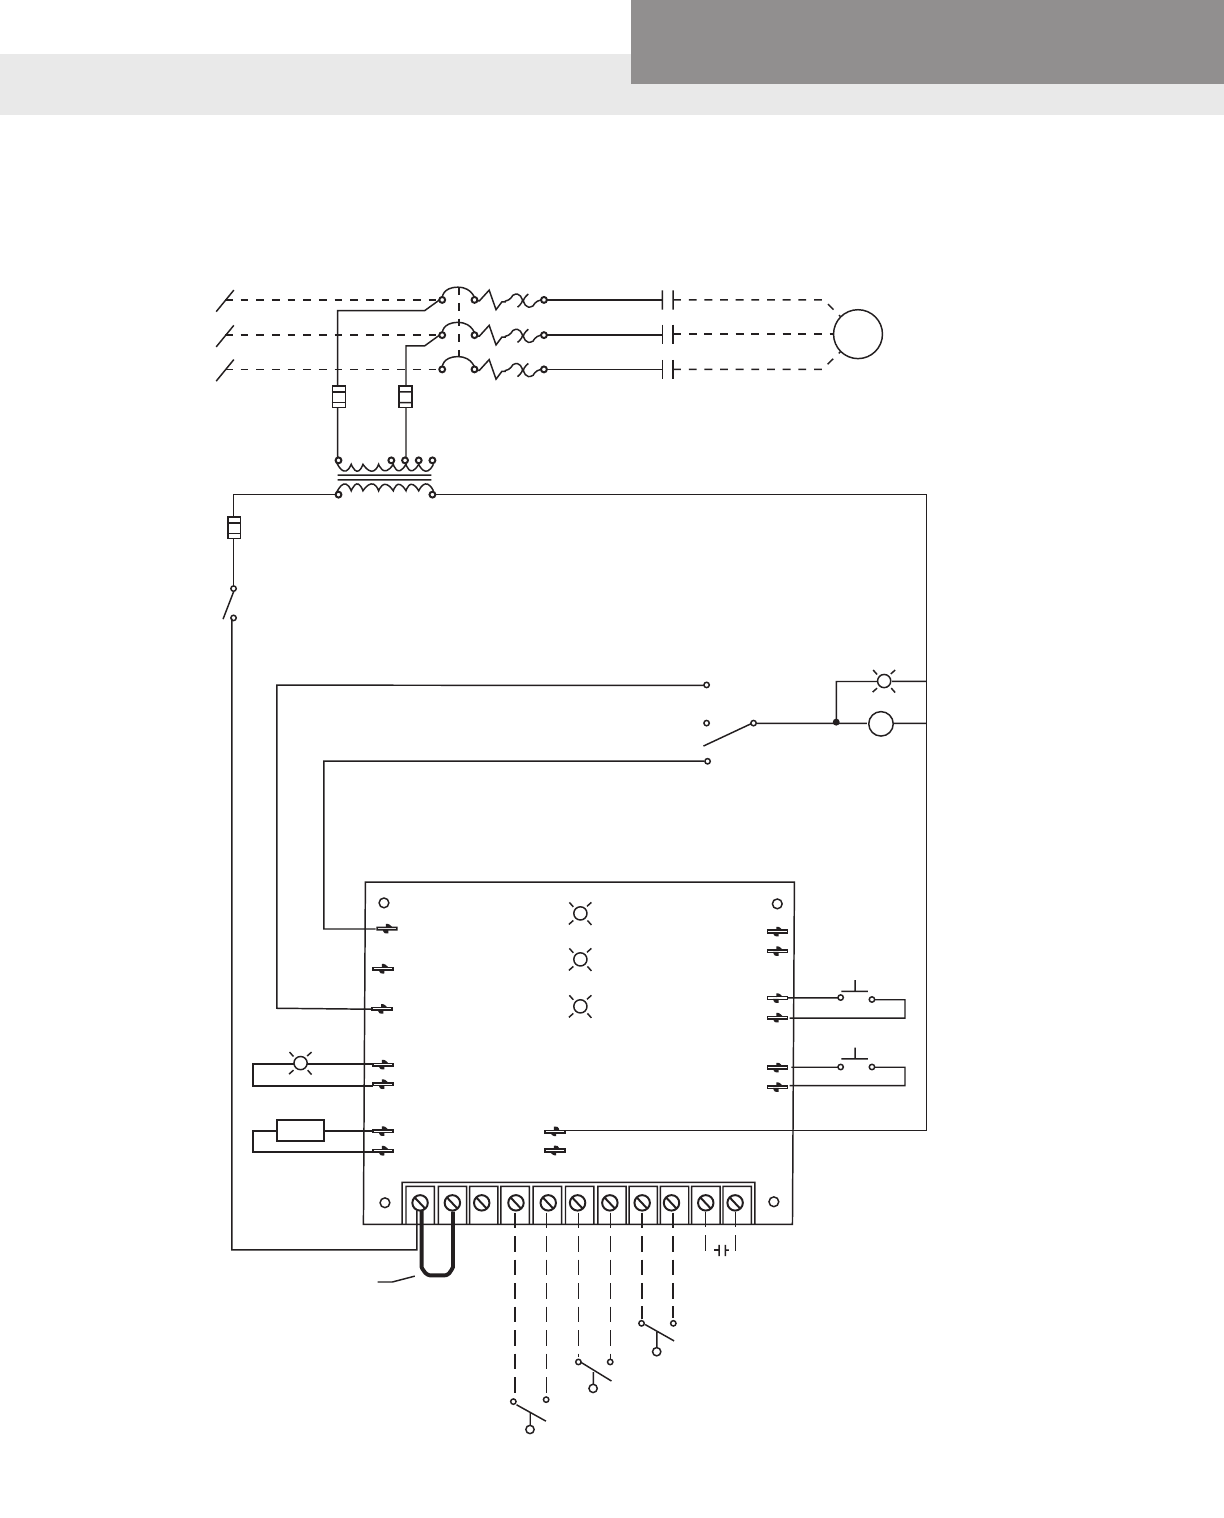 Nema 14 Wiring Diagram 540202 2 Centripro Ses S10020 S32232 Simplex Control Panel